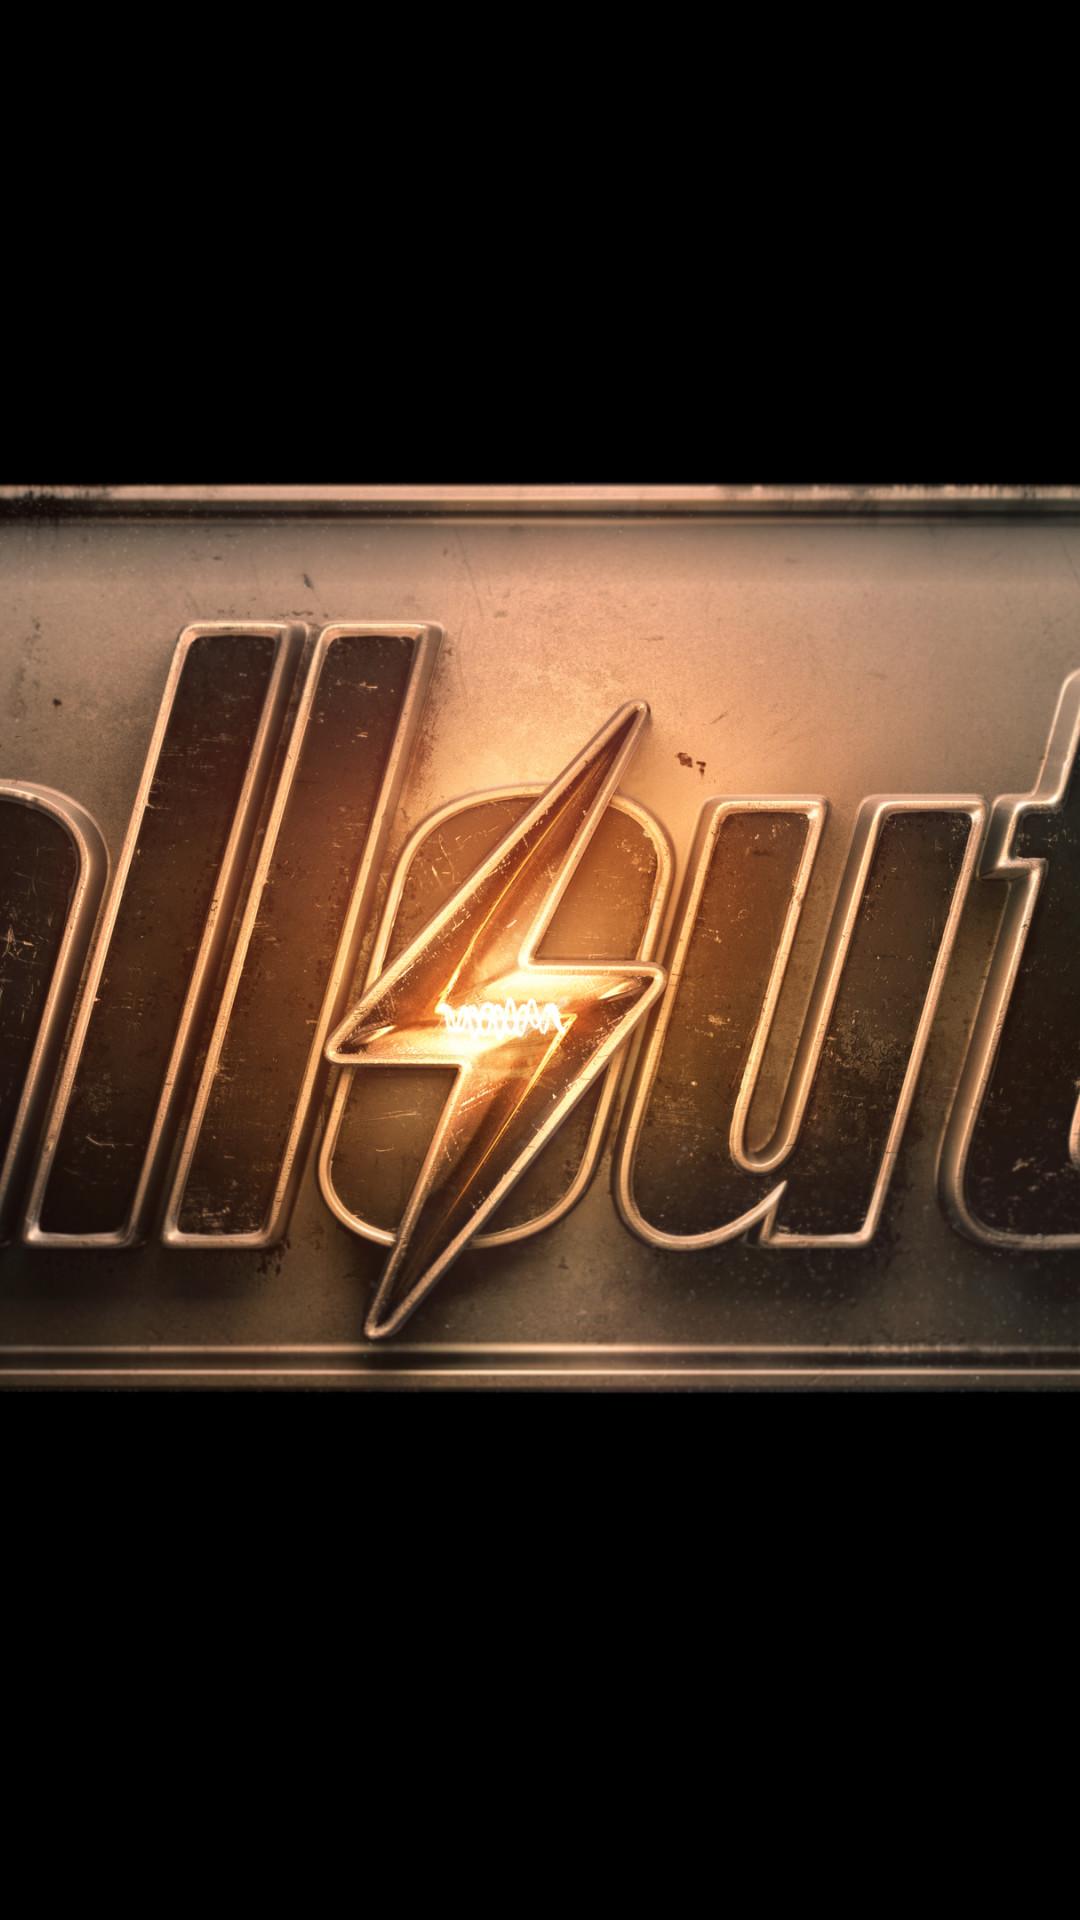 Fallout 4 Logo Wallpaper in 4k iPhone 6 Plus – Wallpaper – HD .